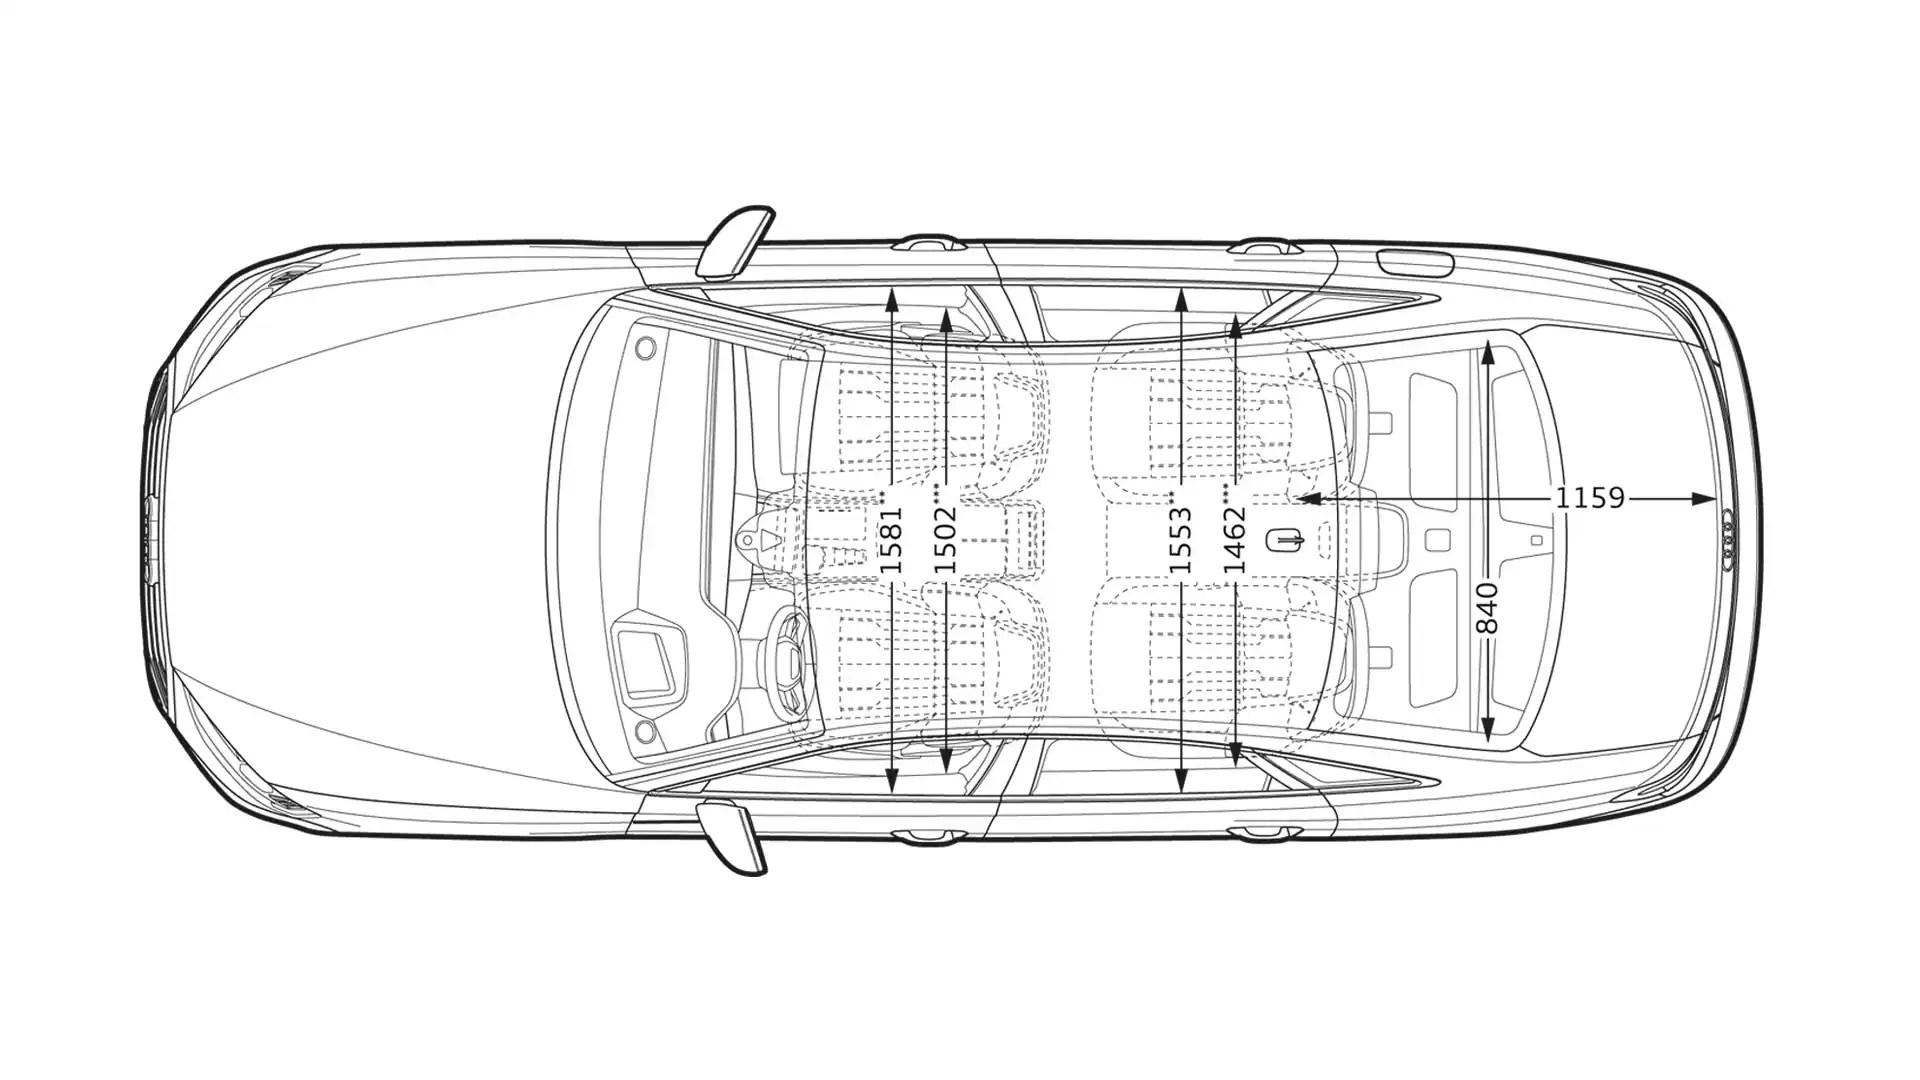 Dimensions > The new Audi A8 > Audi Innovation > Audi St